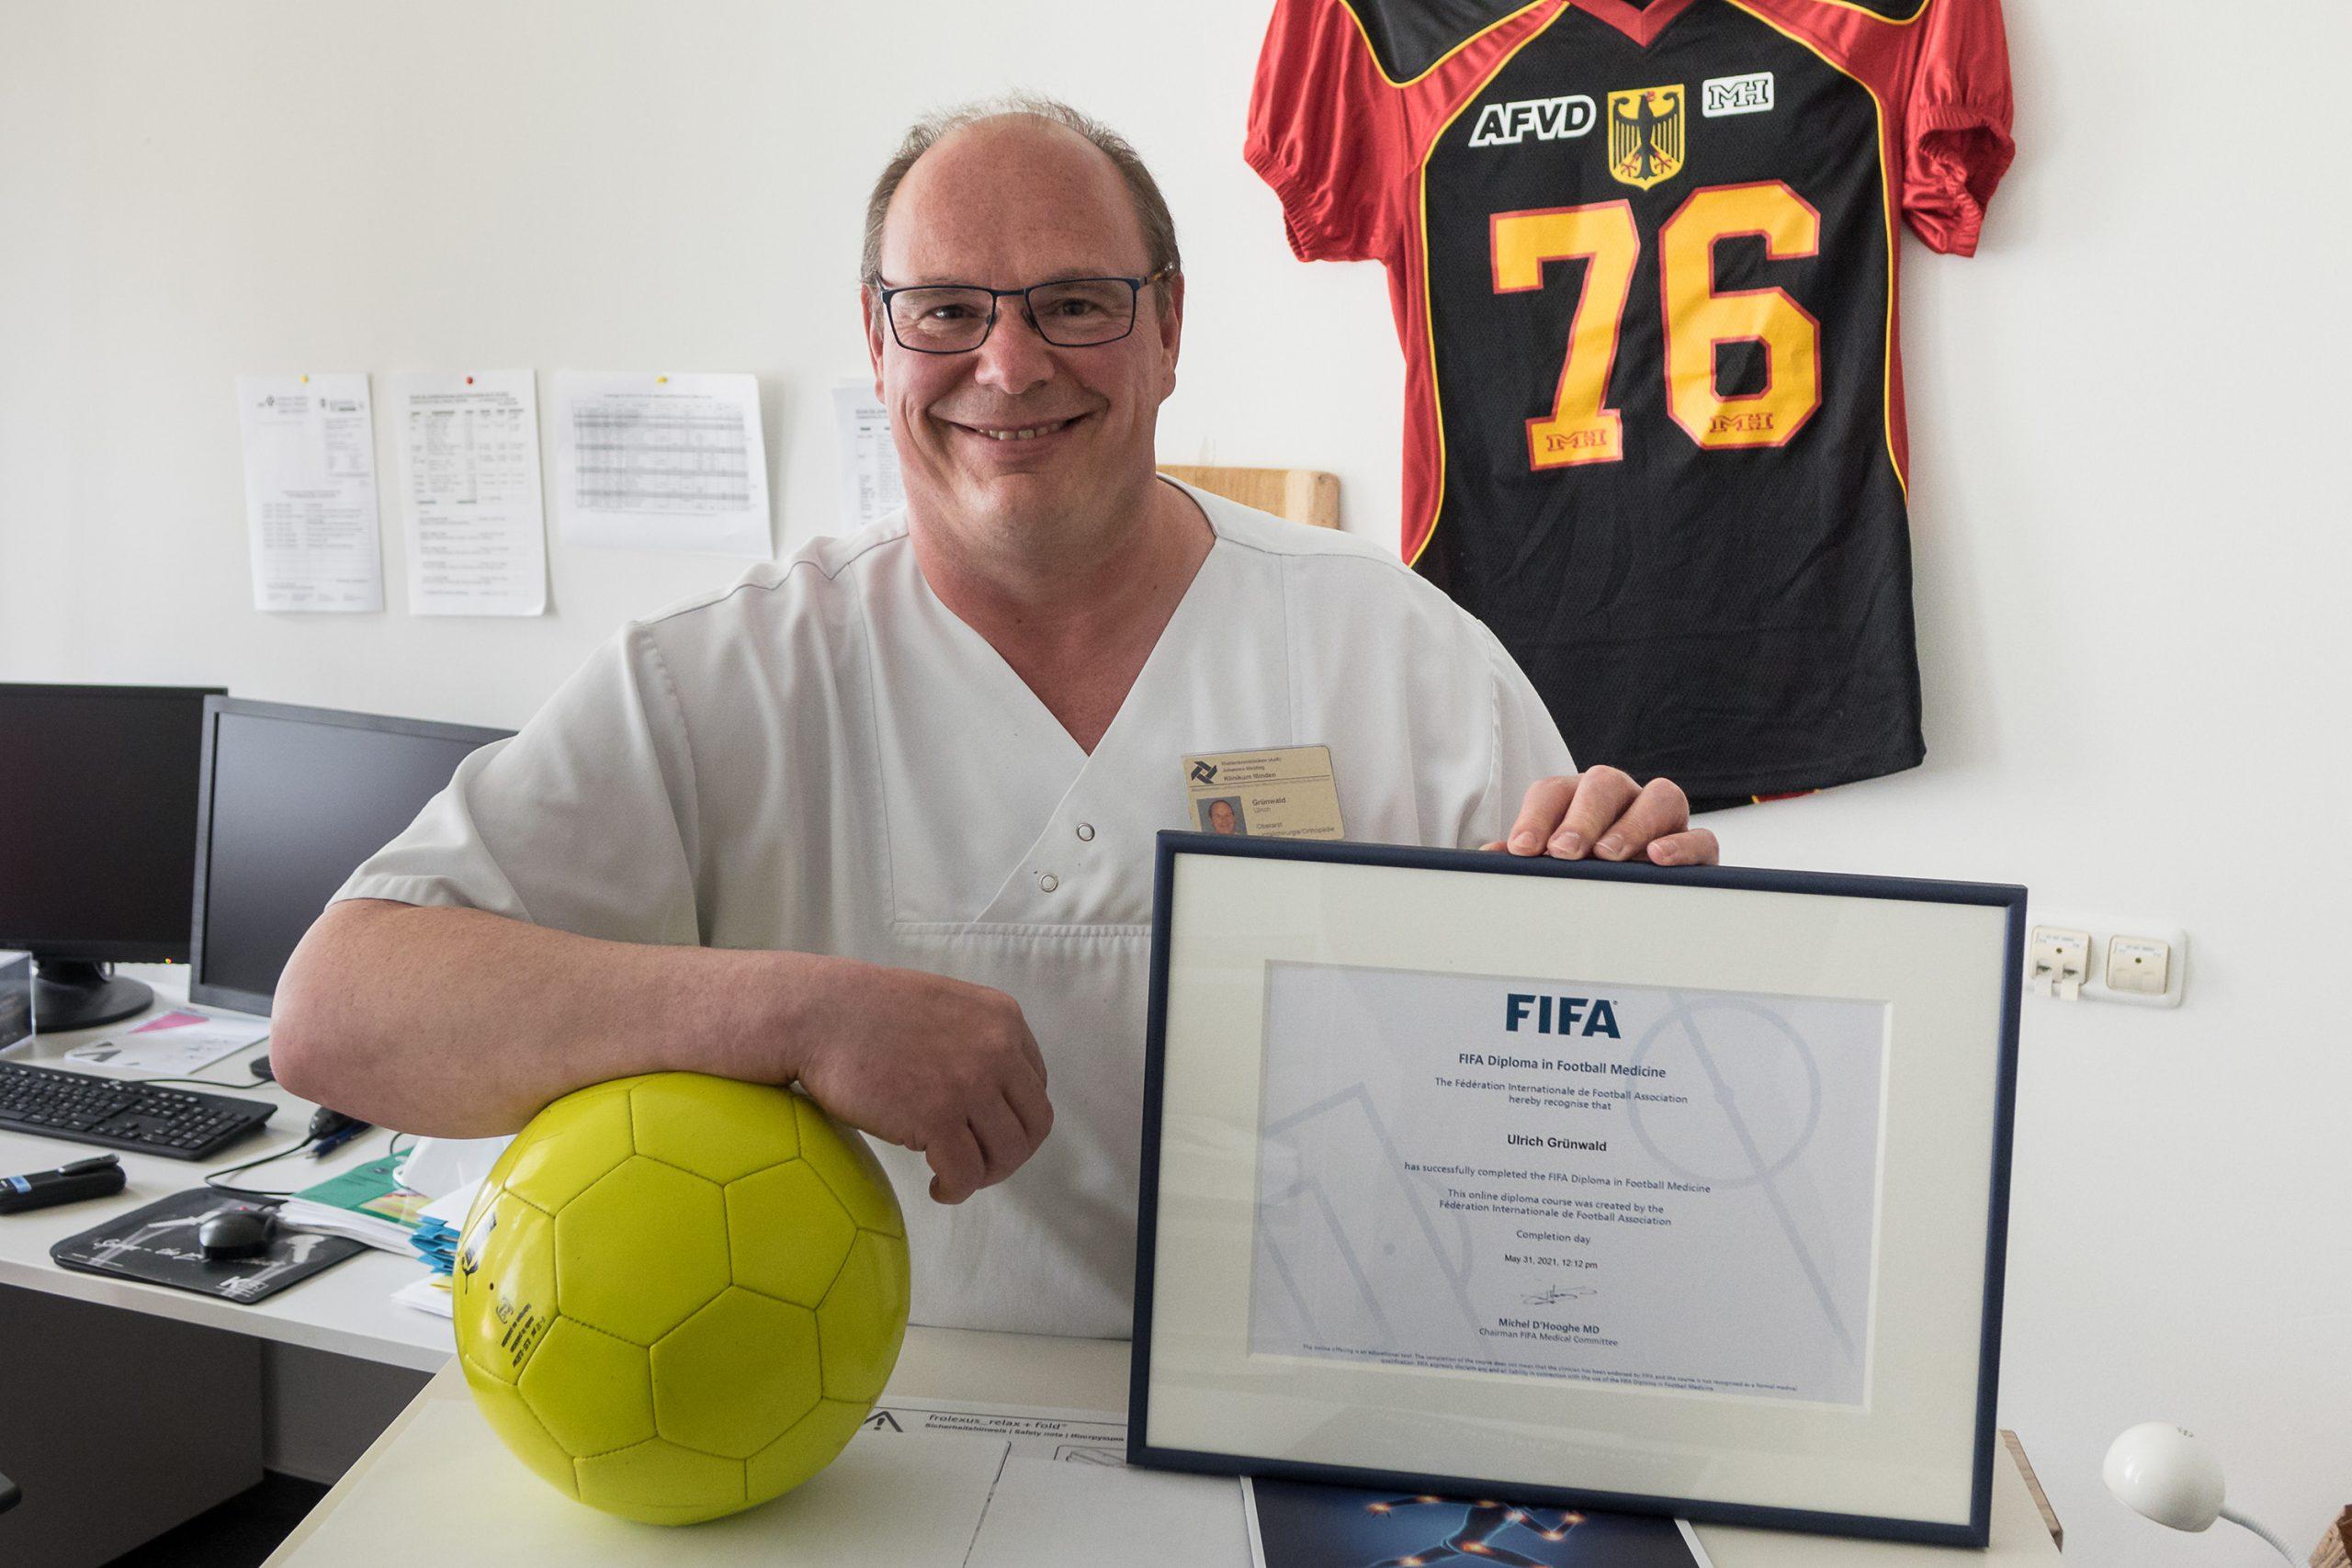 FIFA-Diplom_Ulrich_Grünwald (Mühlenkreiskliniken AöR)